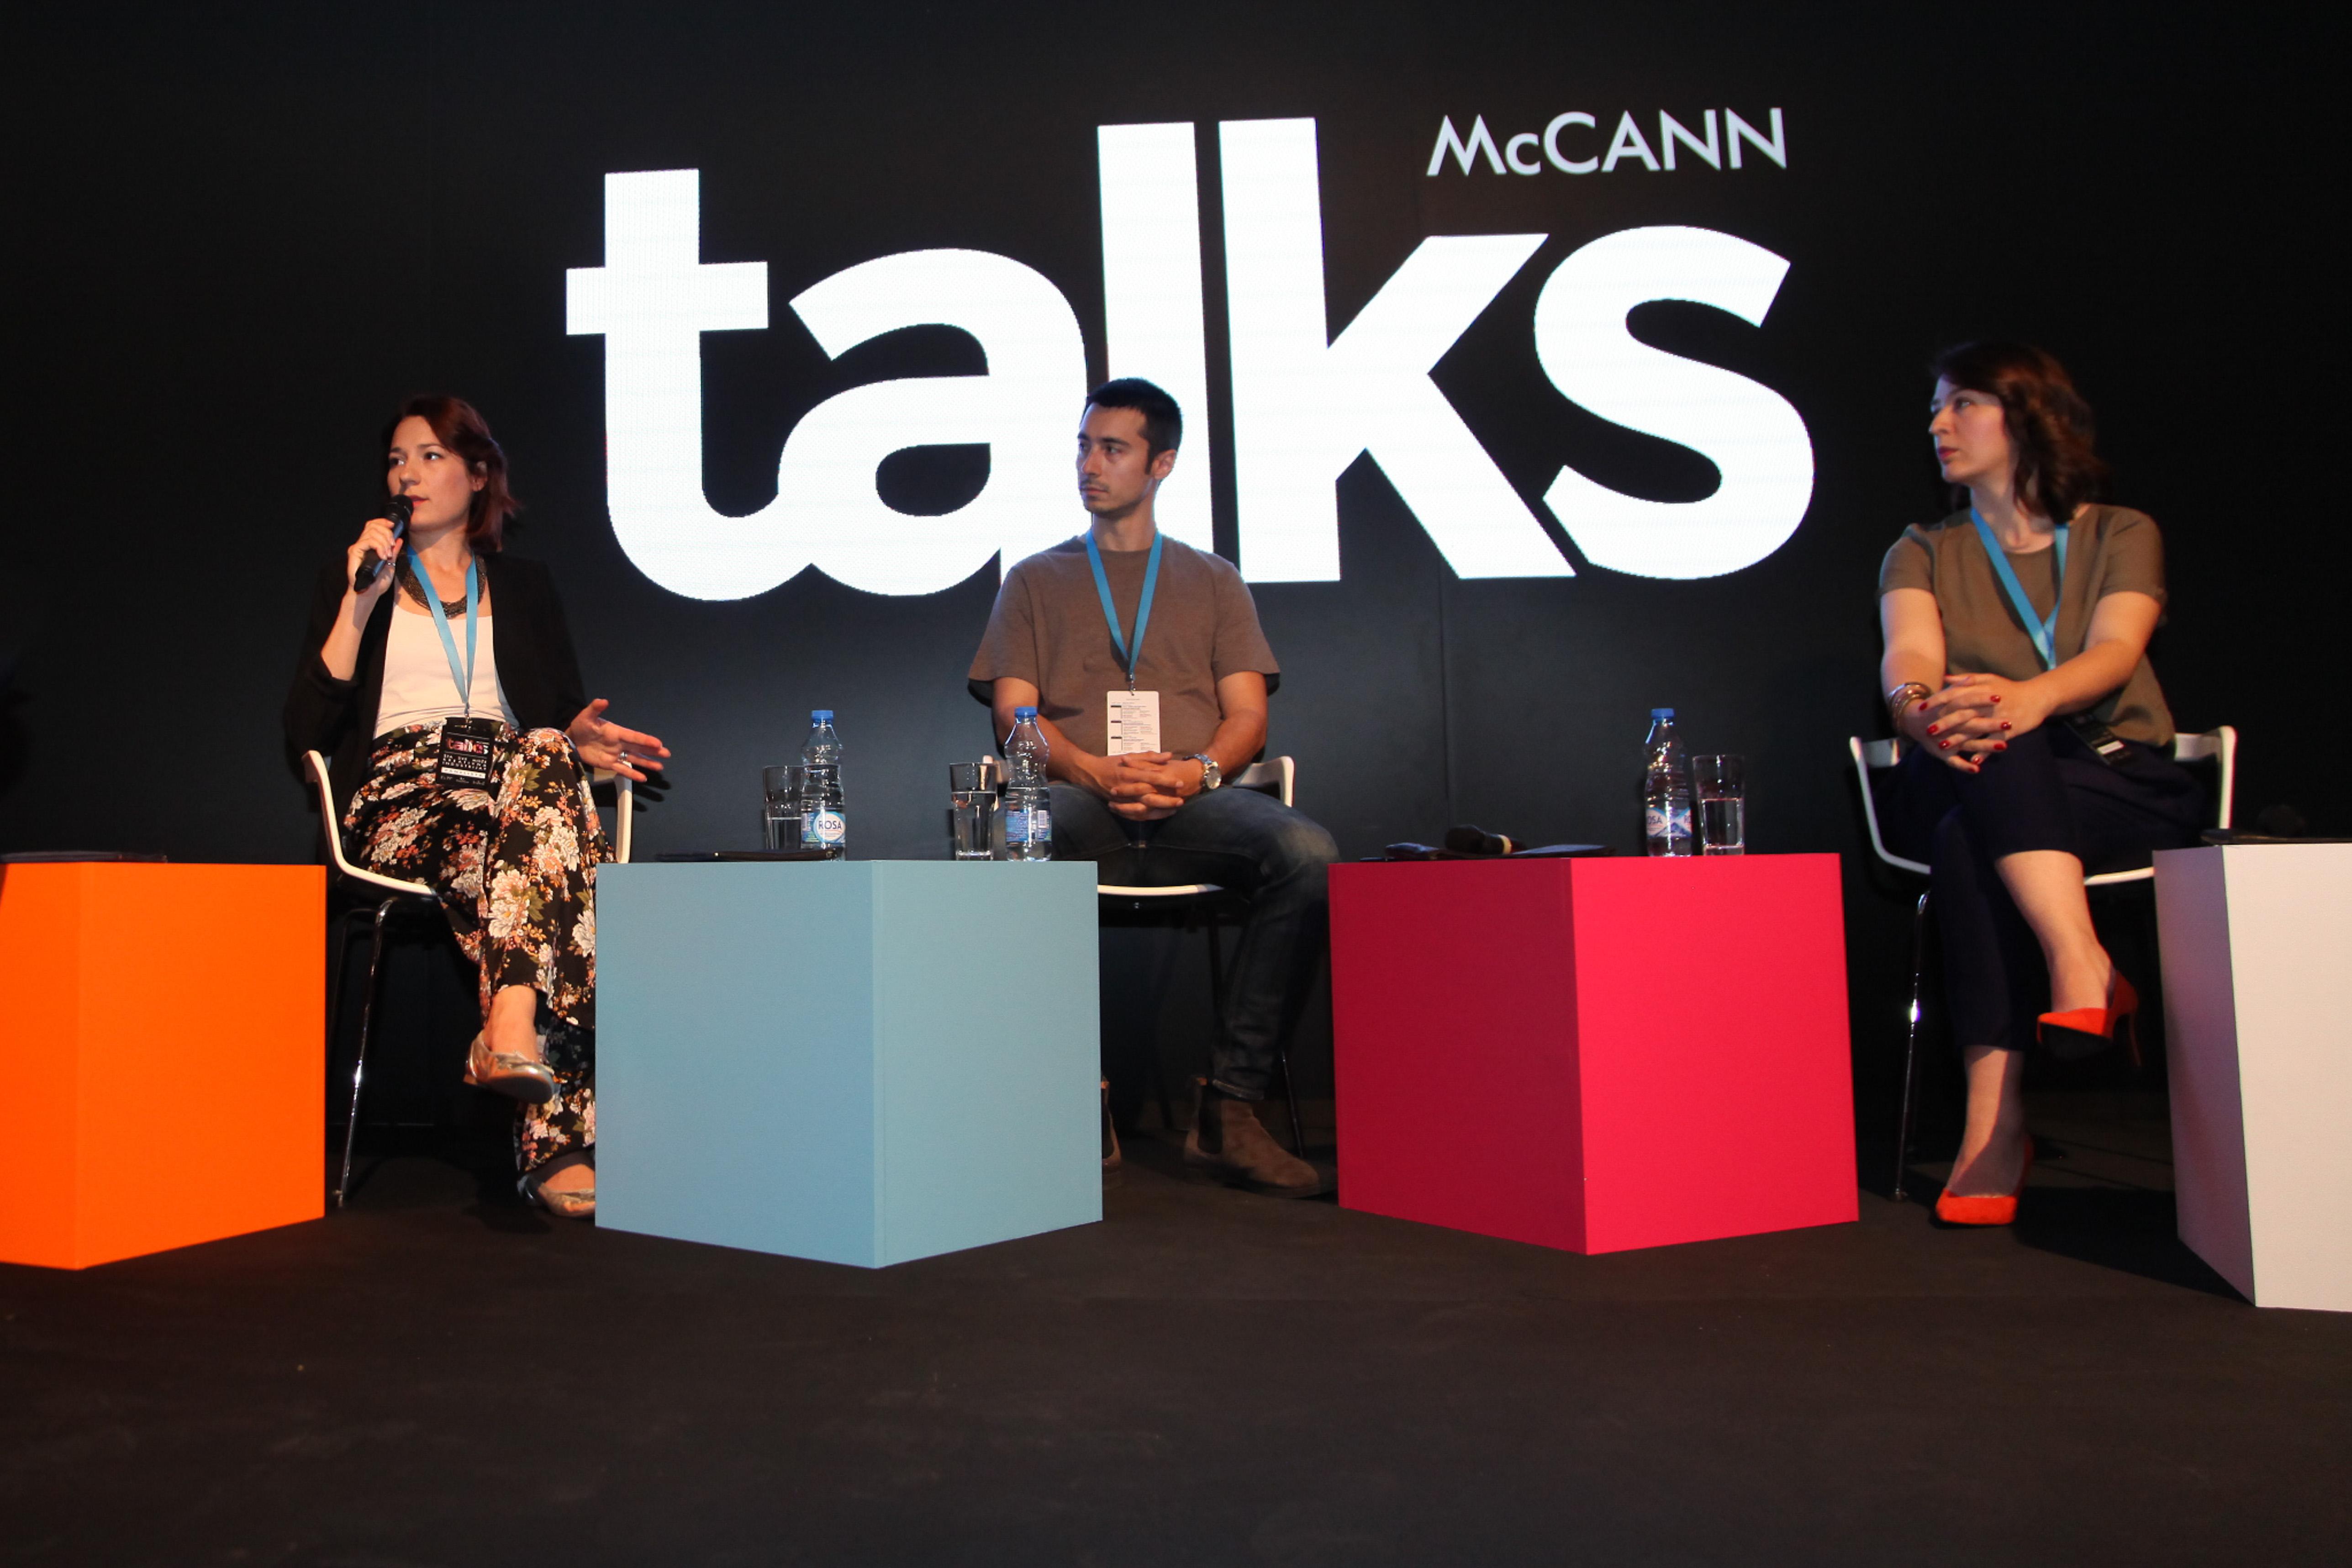 McCann Talks - Milica Božanić, Srpska filmska asocijacija, Mirko Topalski, Eipix, i Jana Savić Rastovac, McCann Beograd